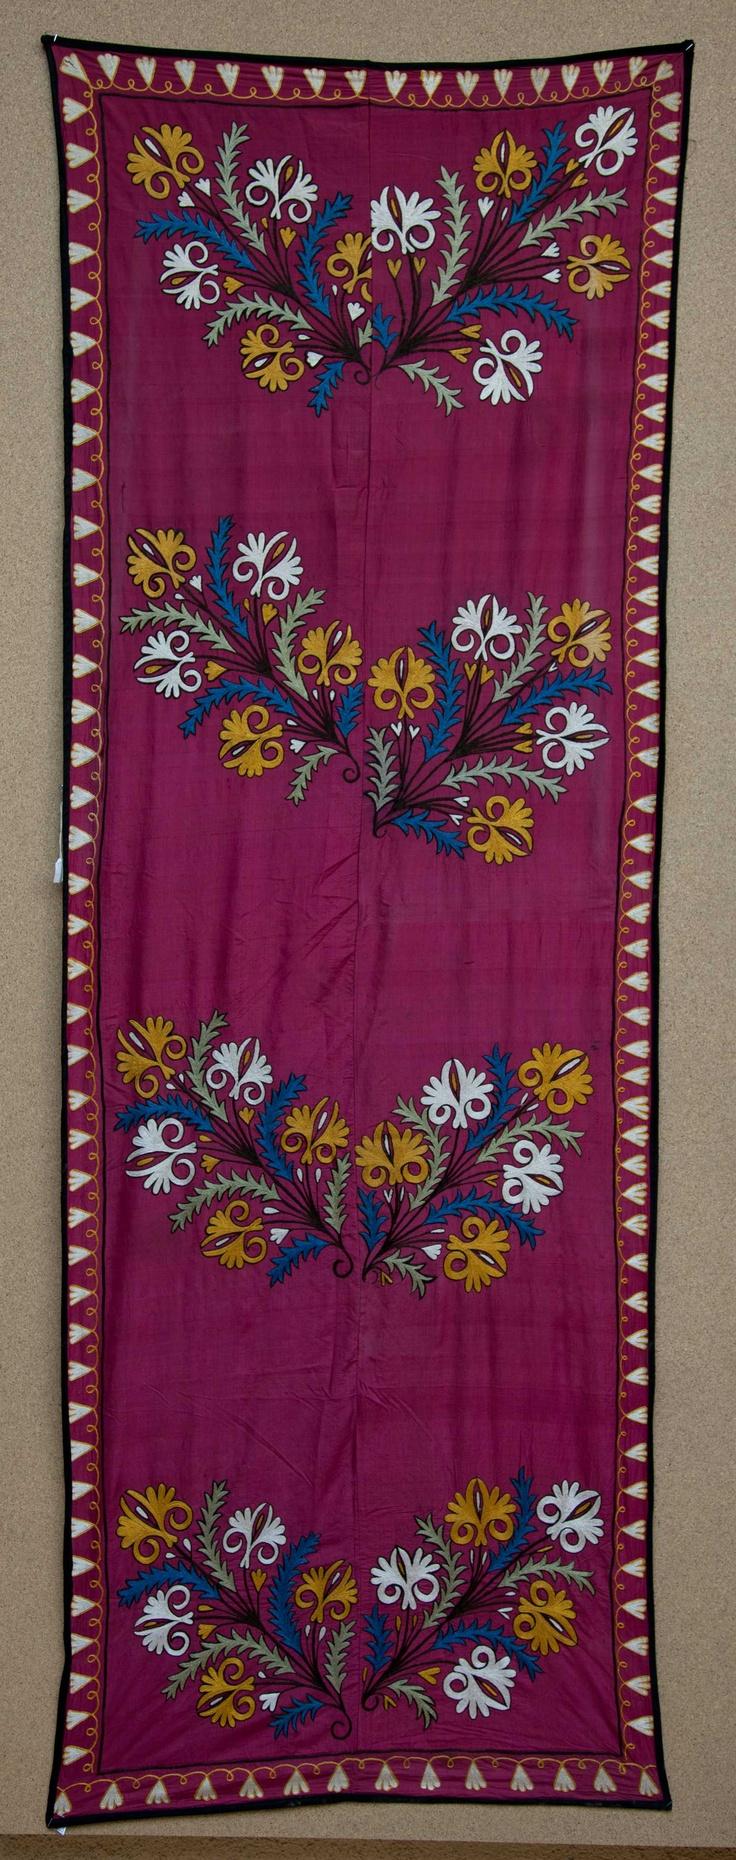 antique Uzbek Suzani Fragment, silk embroidery.